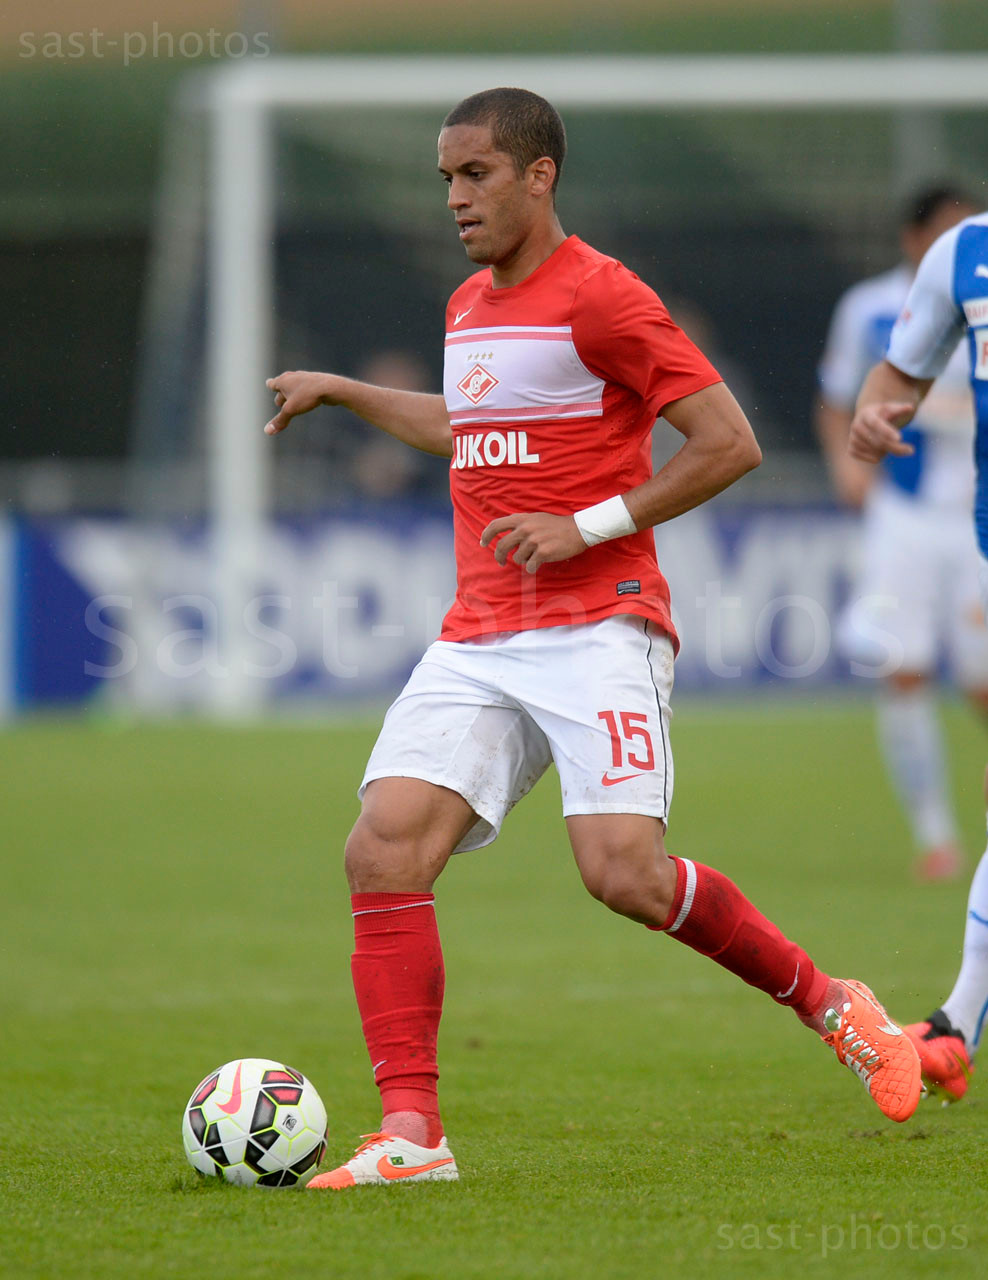 Romulo Borjes Monteira (Spartak)